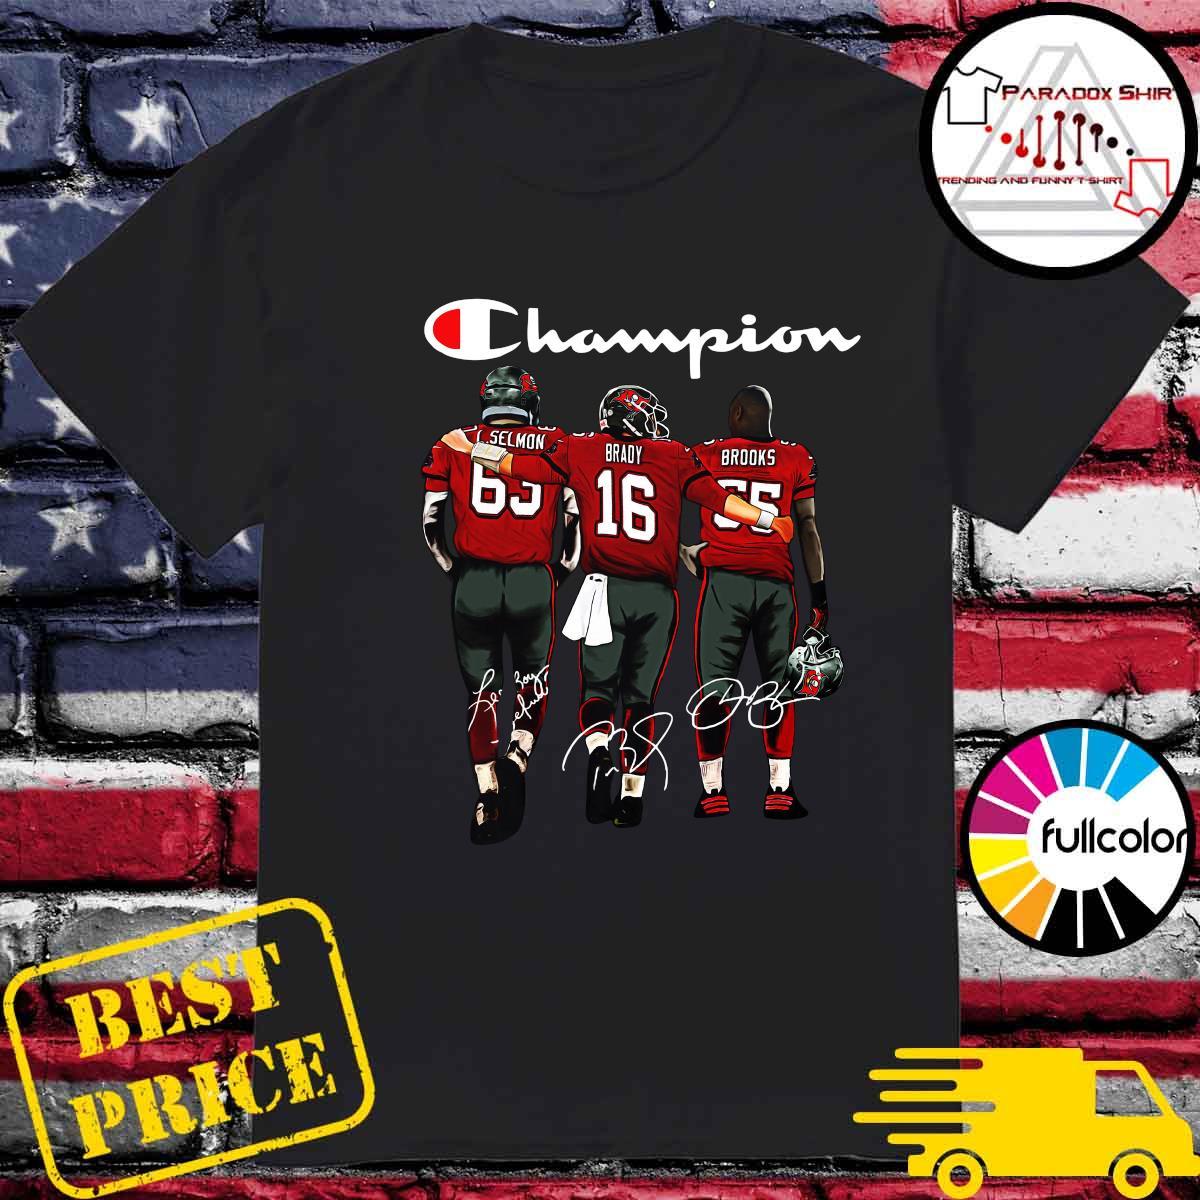 Champion Tampa Bay Buccaneers Lee Roy Selmon 63 Tom Brady 16 Derrick Brooks 55 Signatures Shirt